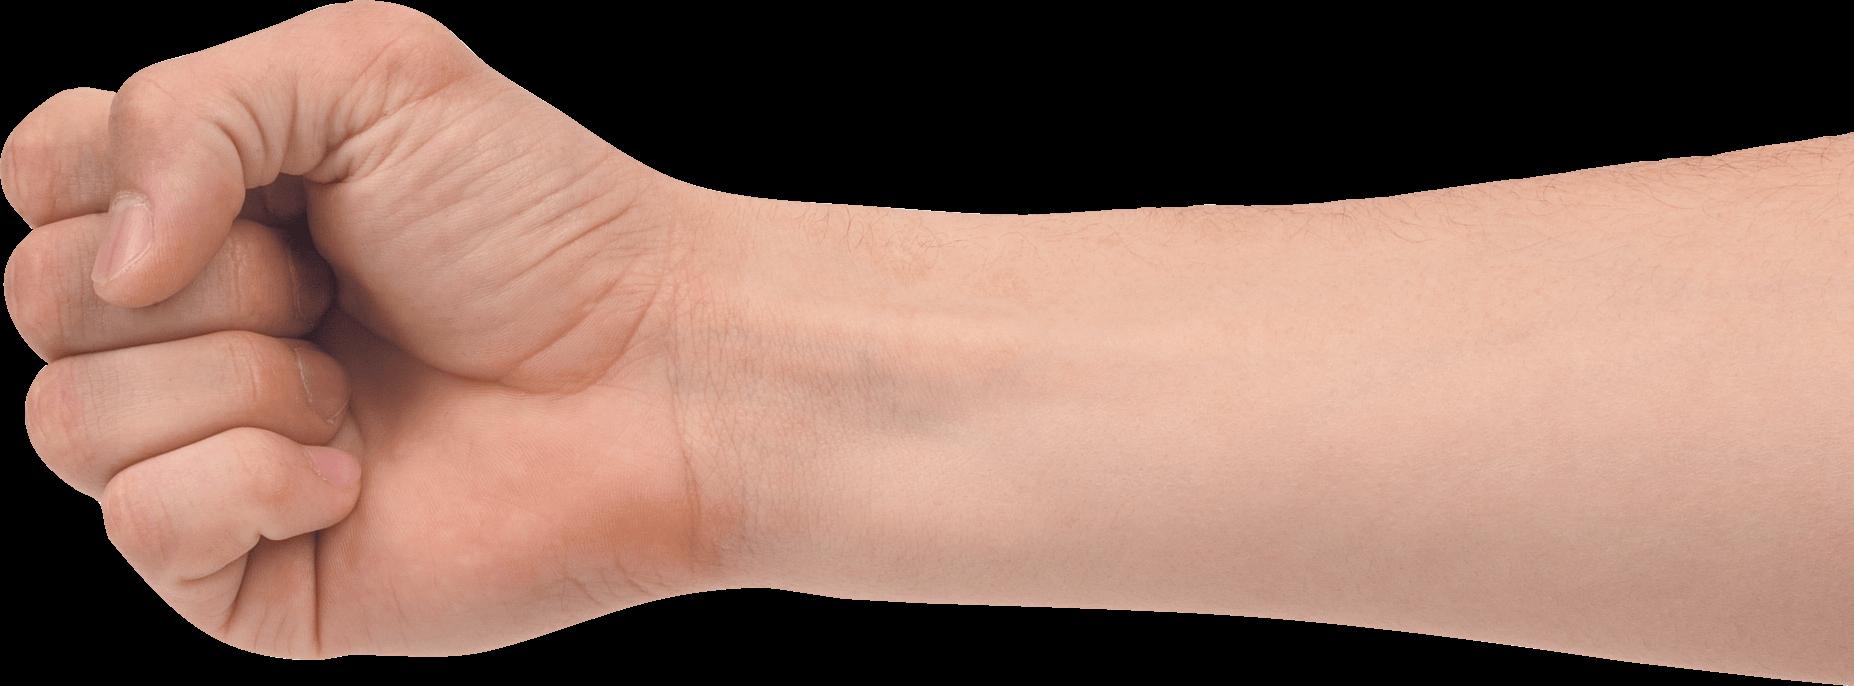 Fist clipart wrist. Hand transparent png stickpng